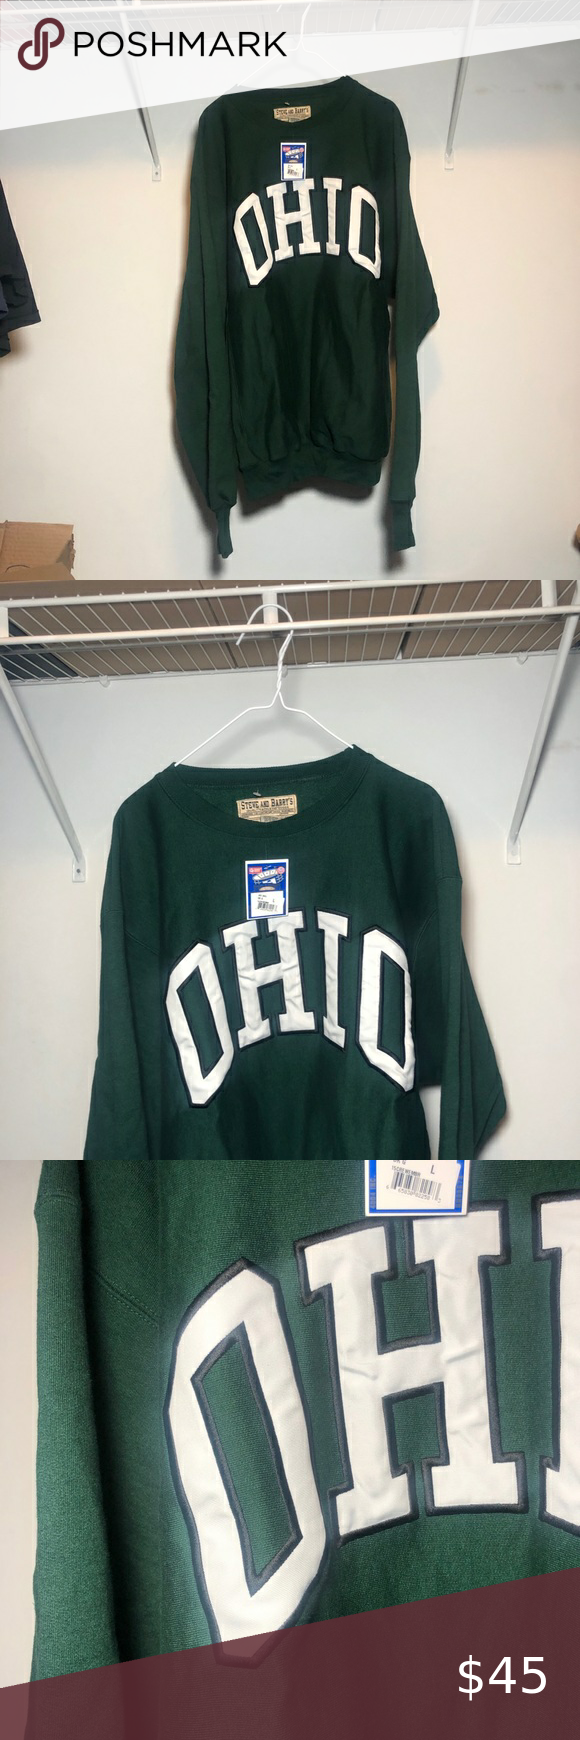 Ohio University Crewneck Sweatshirt Steve Barrys Crew Neck Sweatshirt Sweatshirts Sweatshirt Shirt [ 1740 x 580 Pixel ]